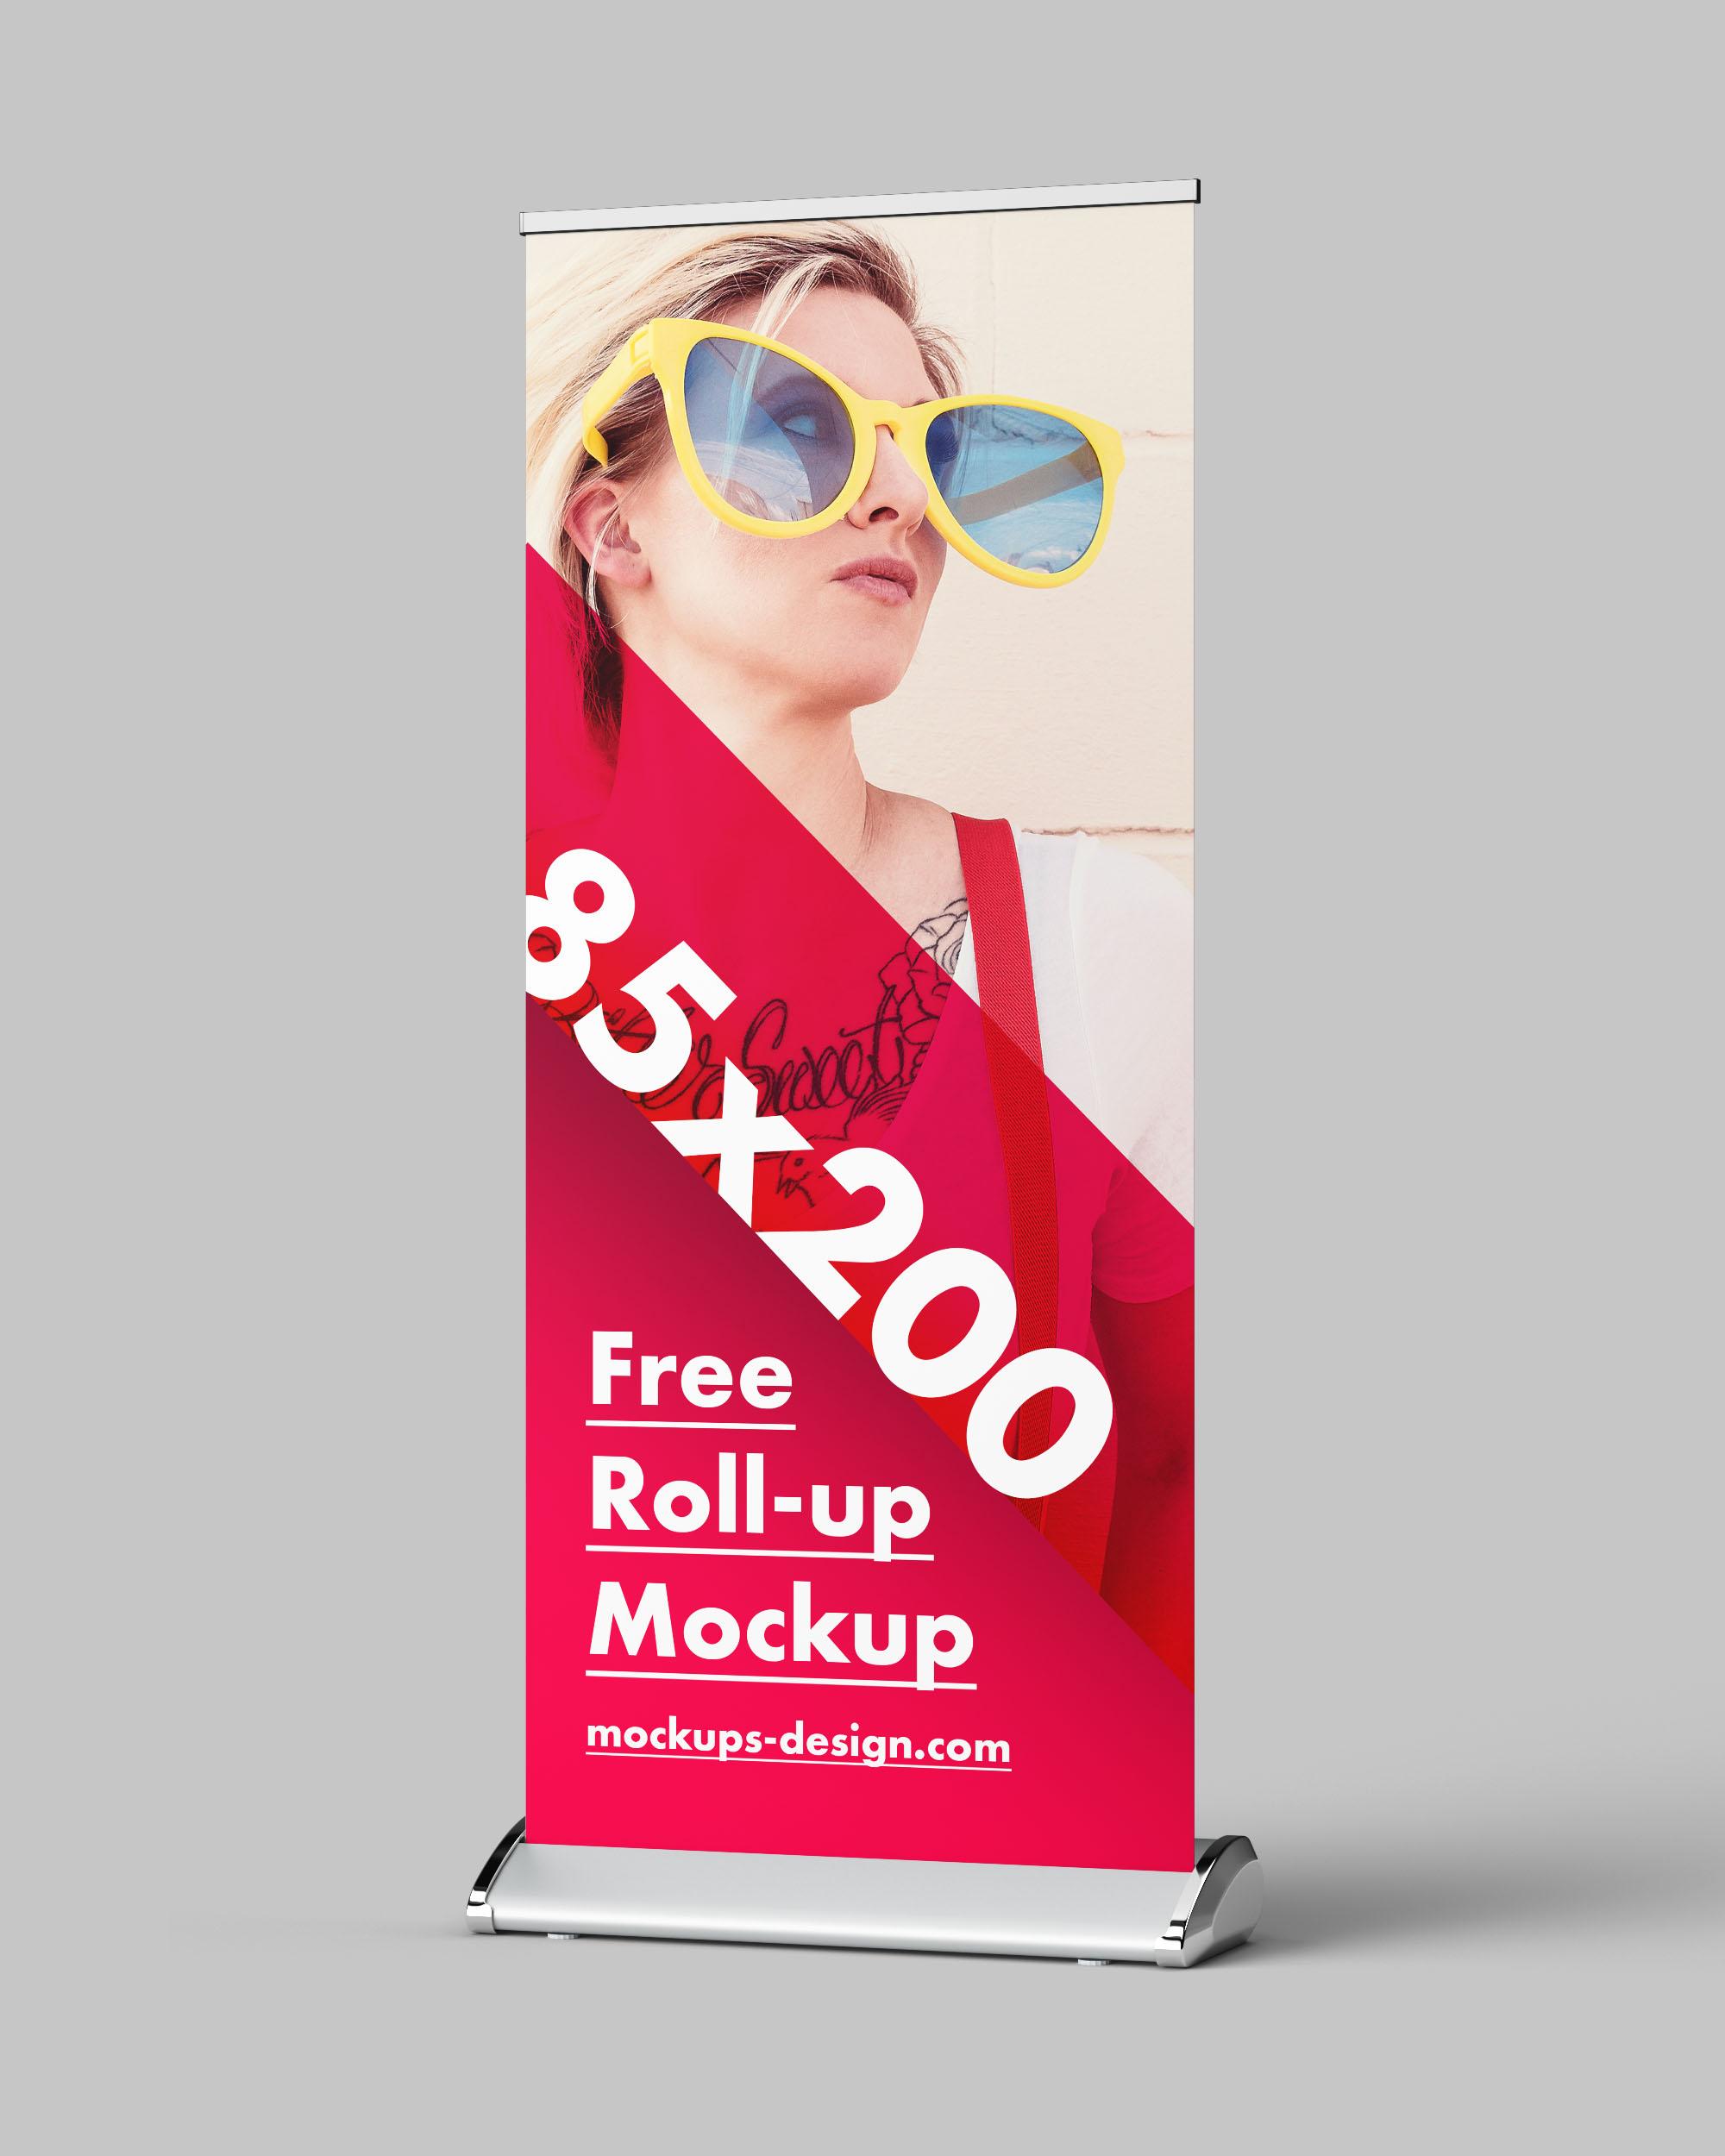 Free Rollup Mockup